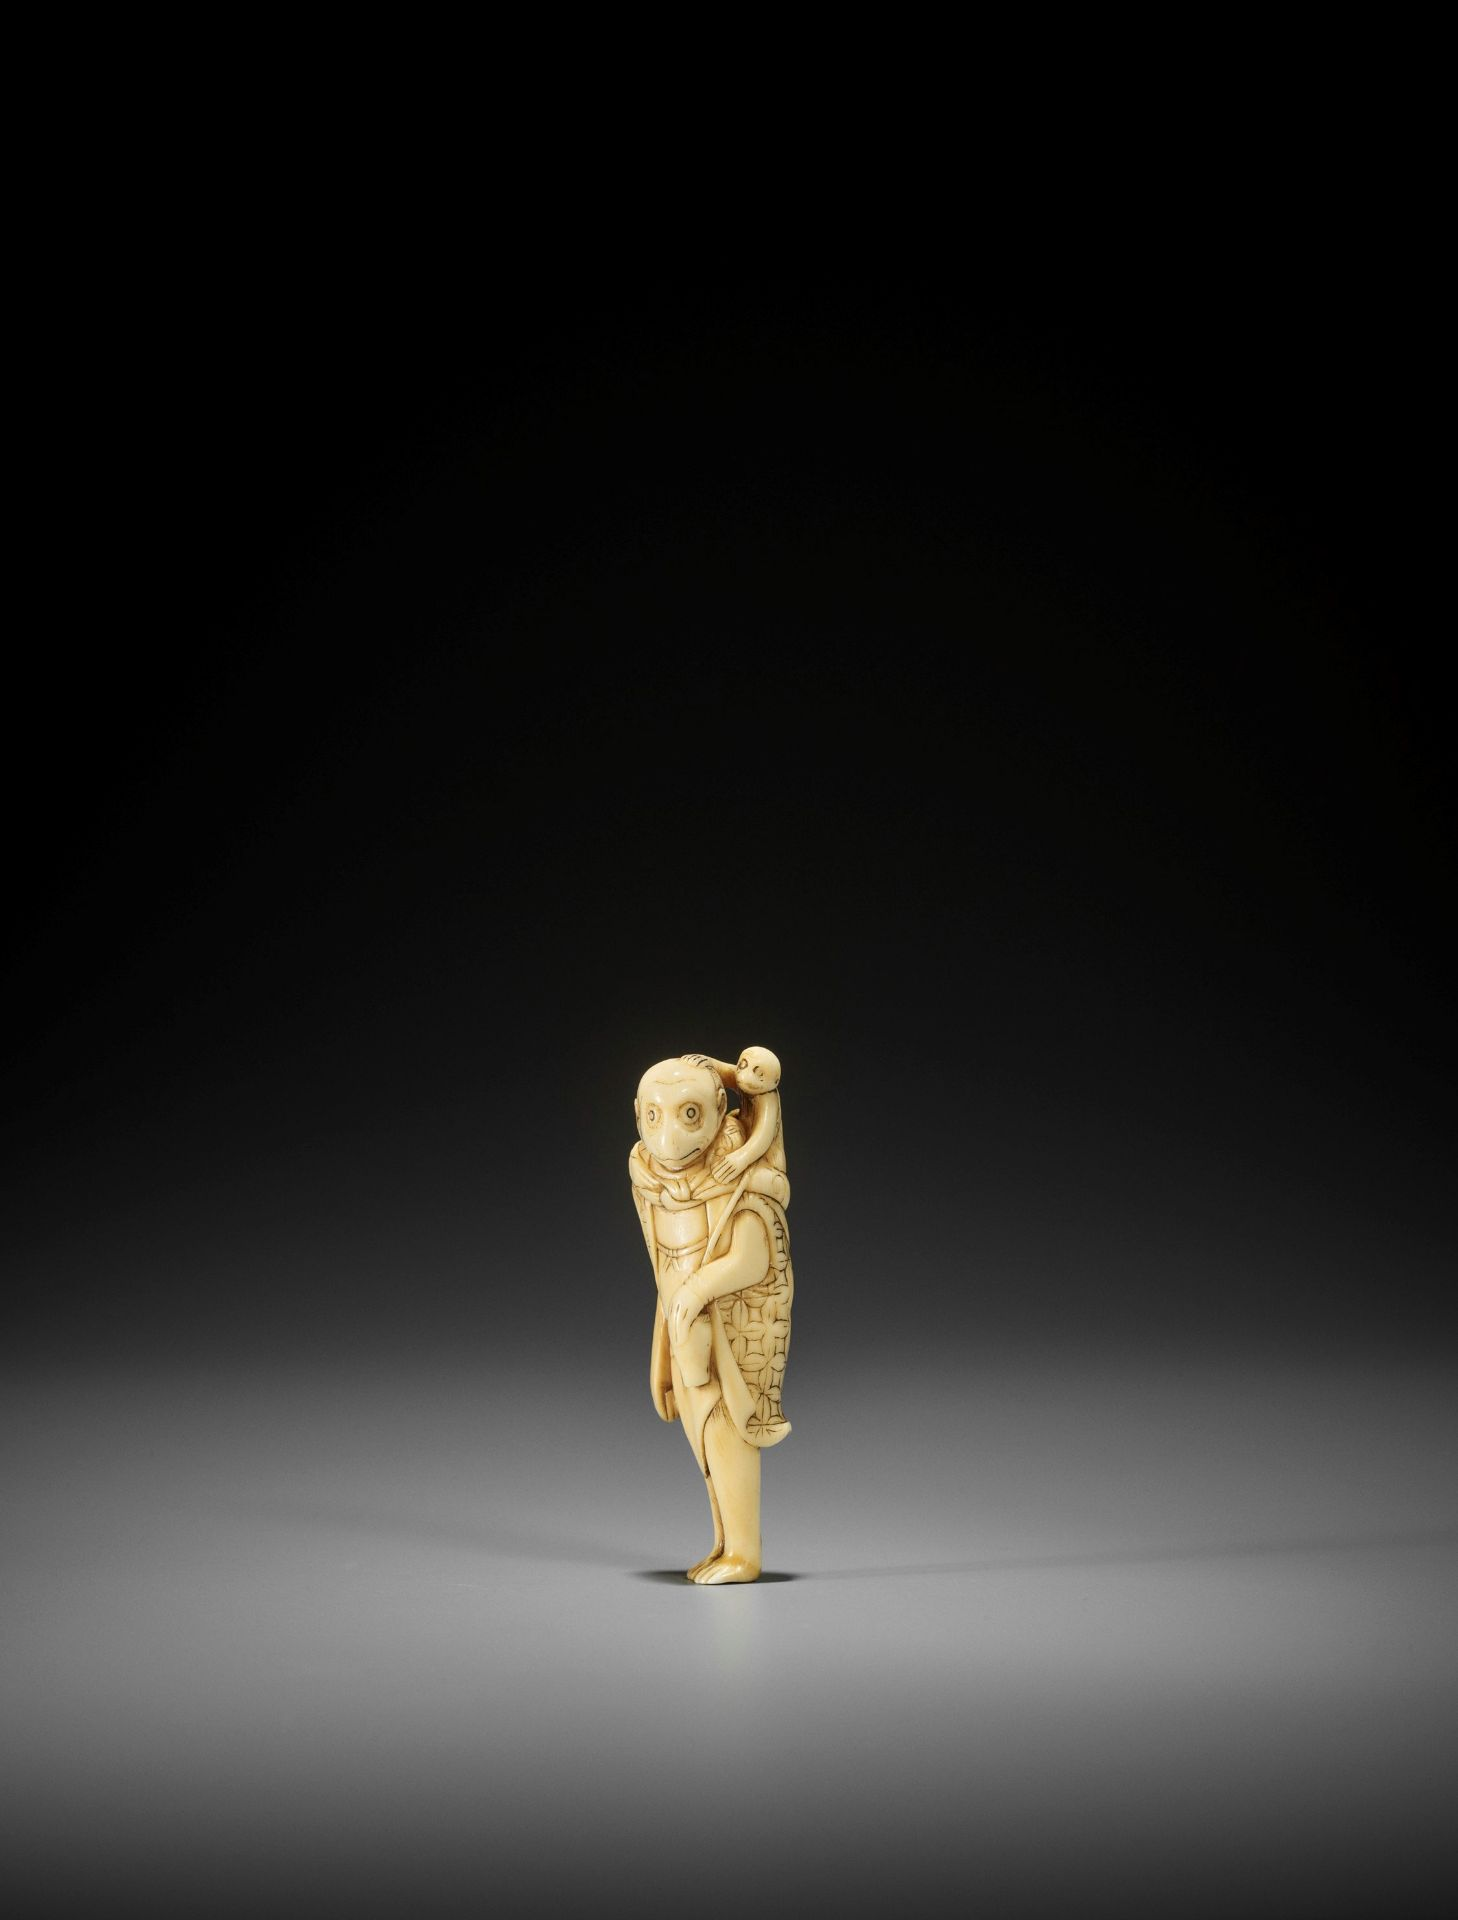 AN UNUSUAL AND EARLY IVORY NETSUKE OF A MONKEY AS A SARUMAWASHI - Image 2 of 3